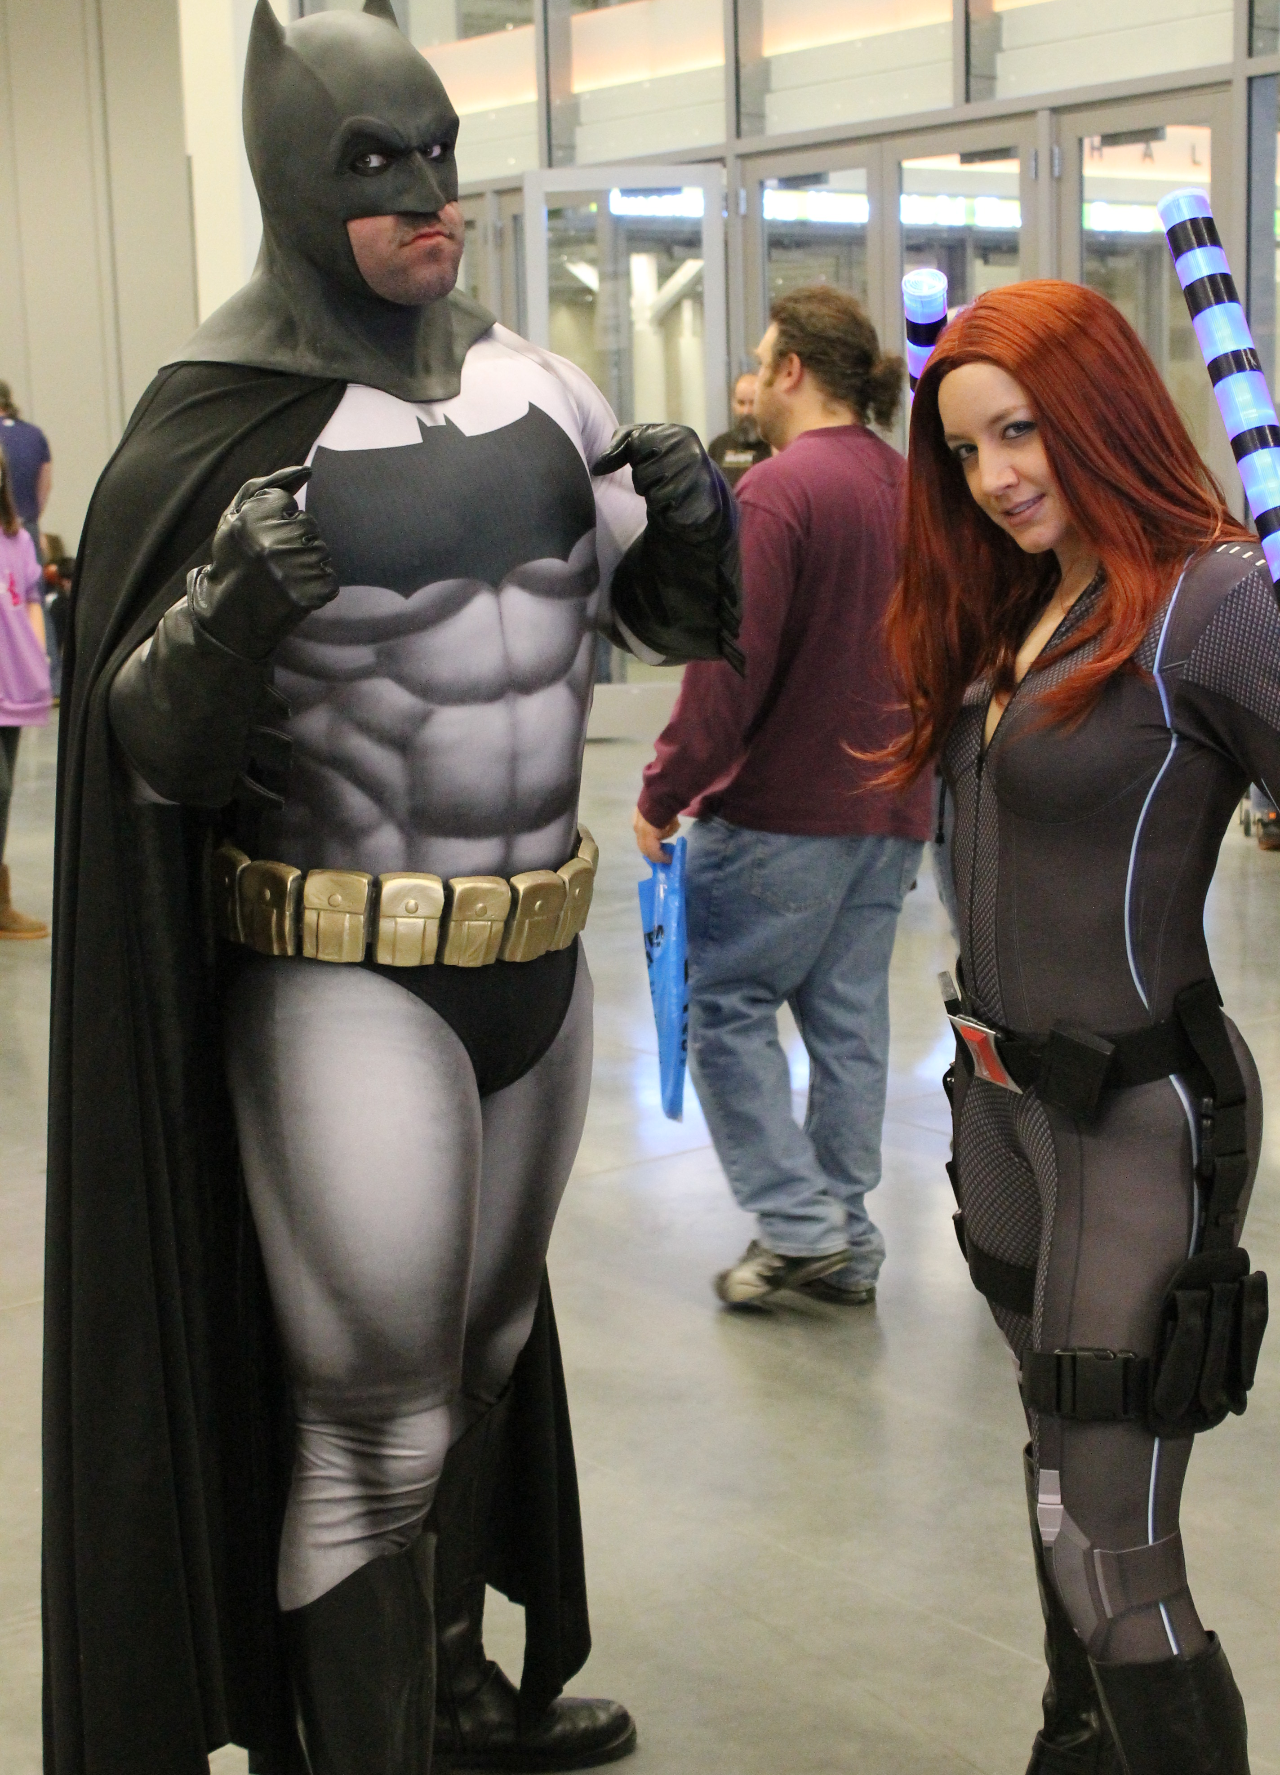 Batman and Black Widow